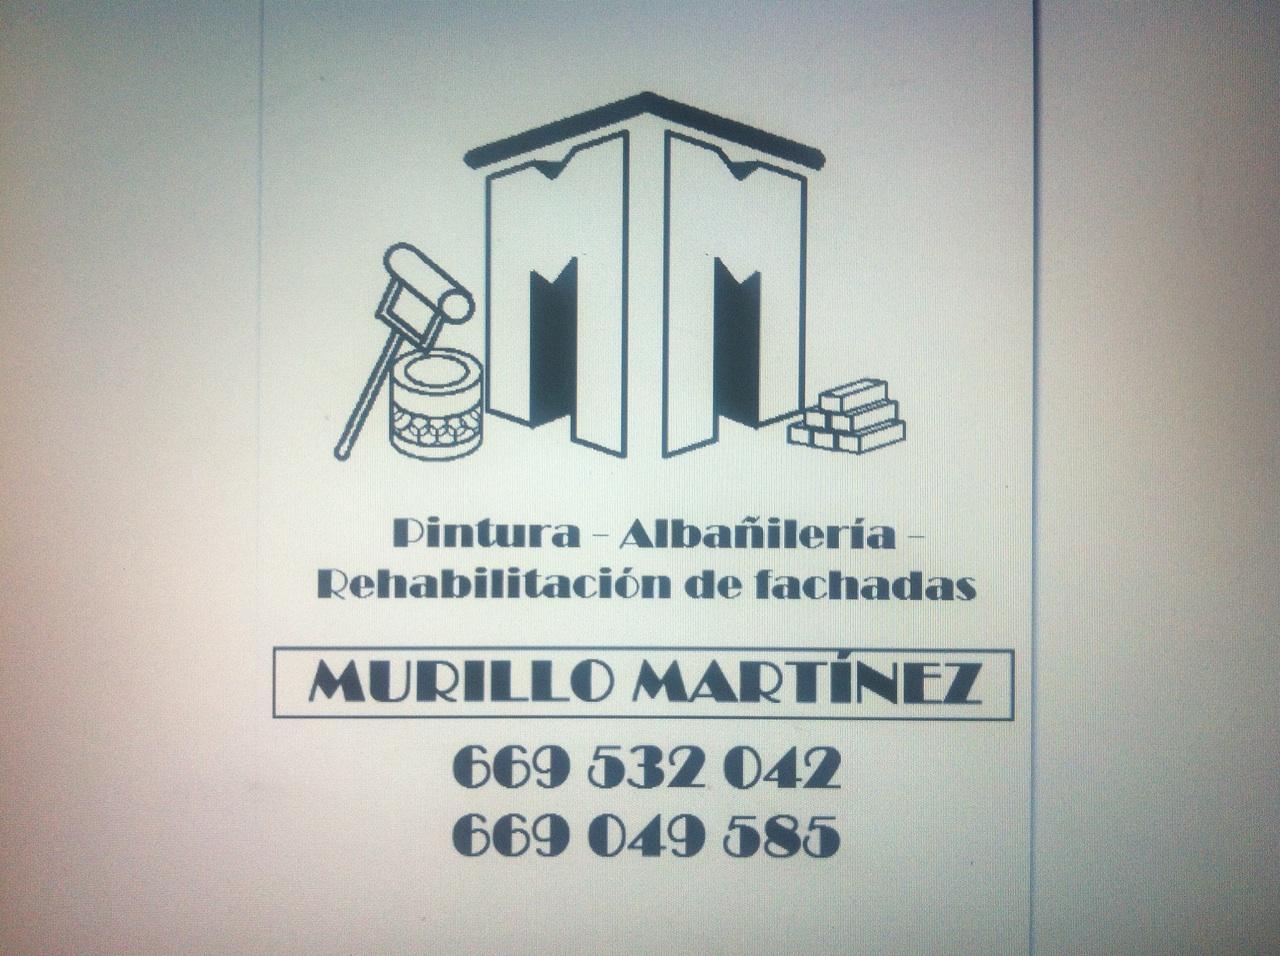 Pinturas: Murillo Martinez